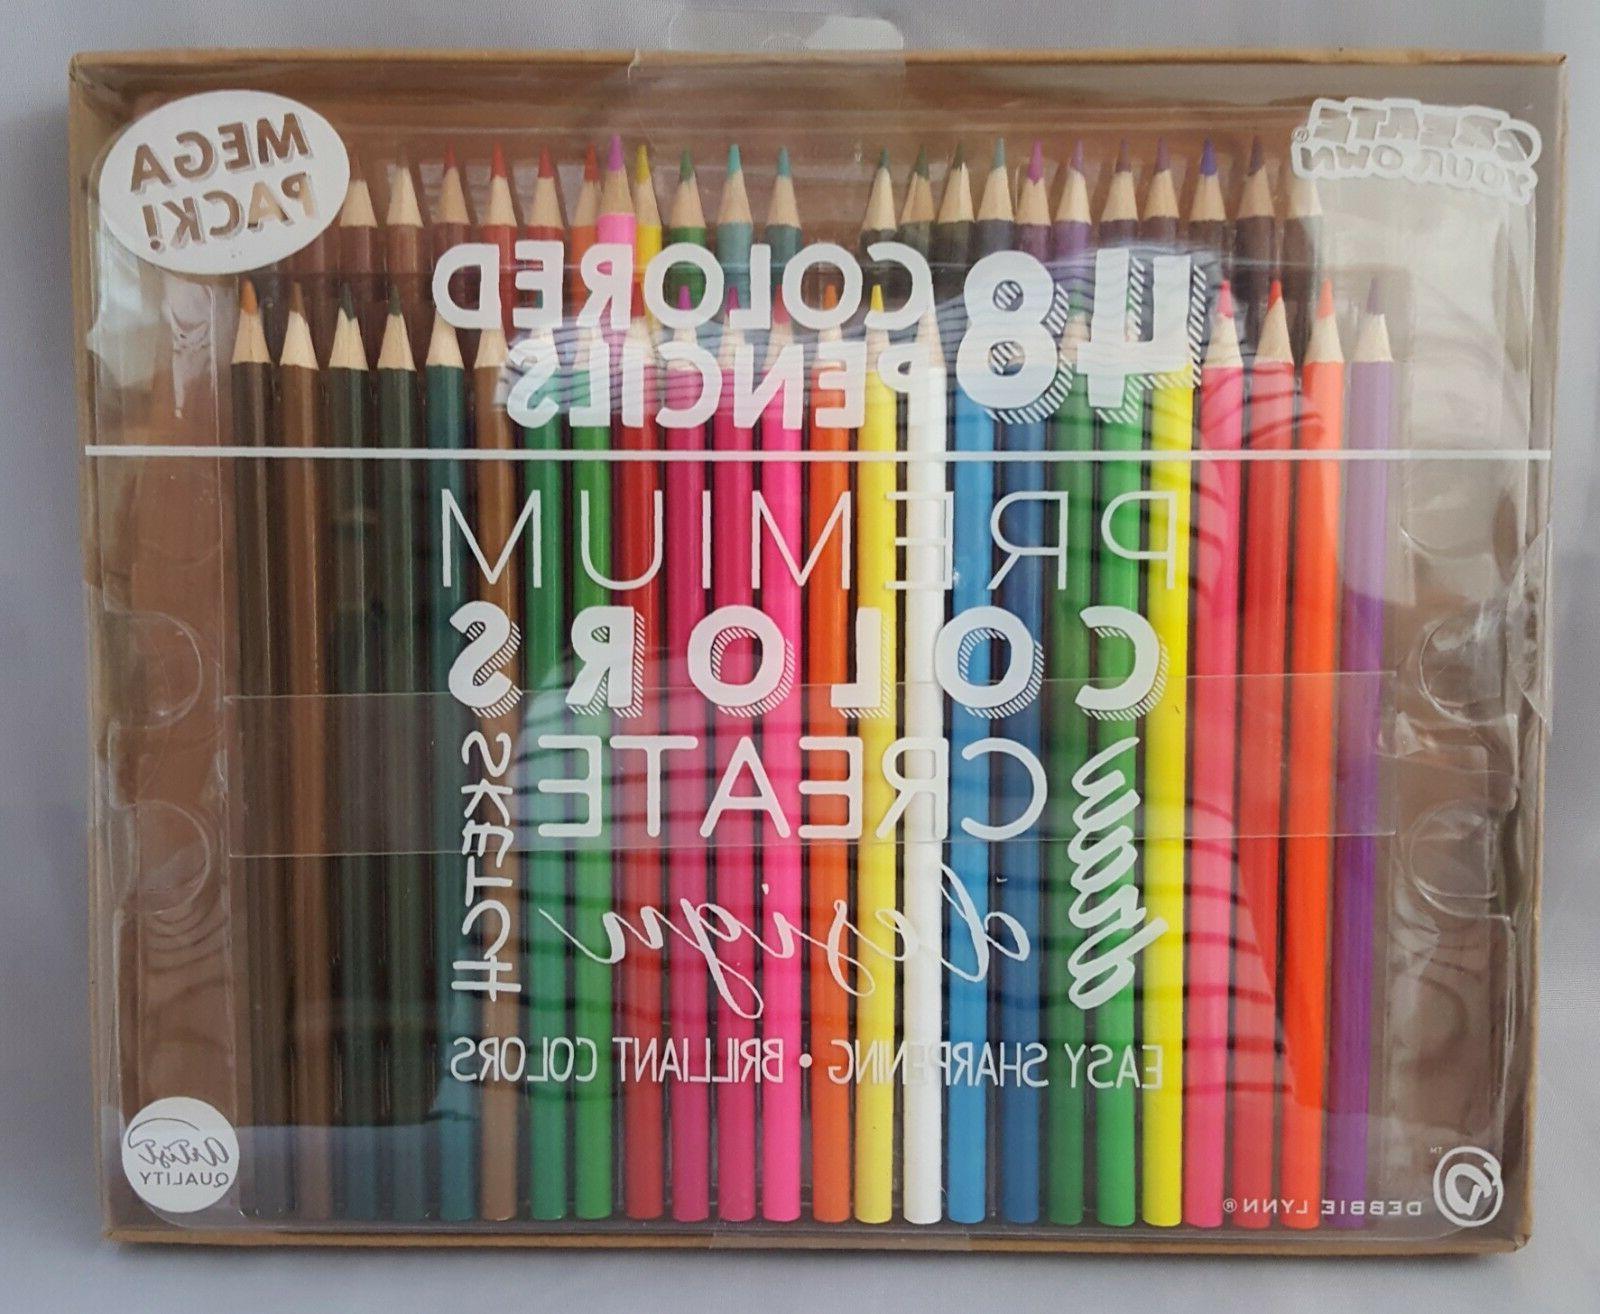 48 premium colored pencils create your own